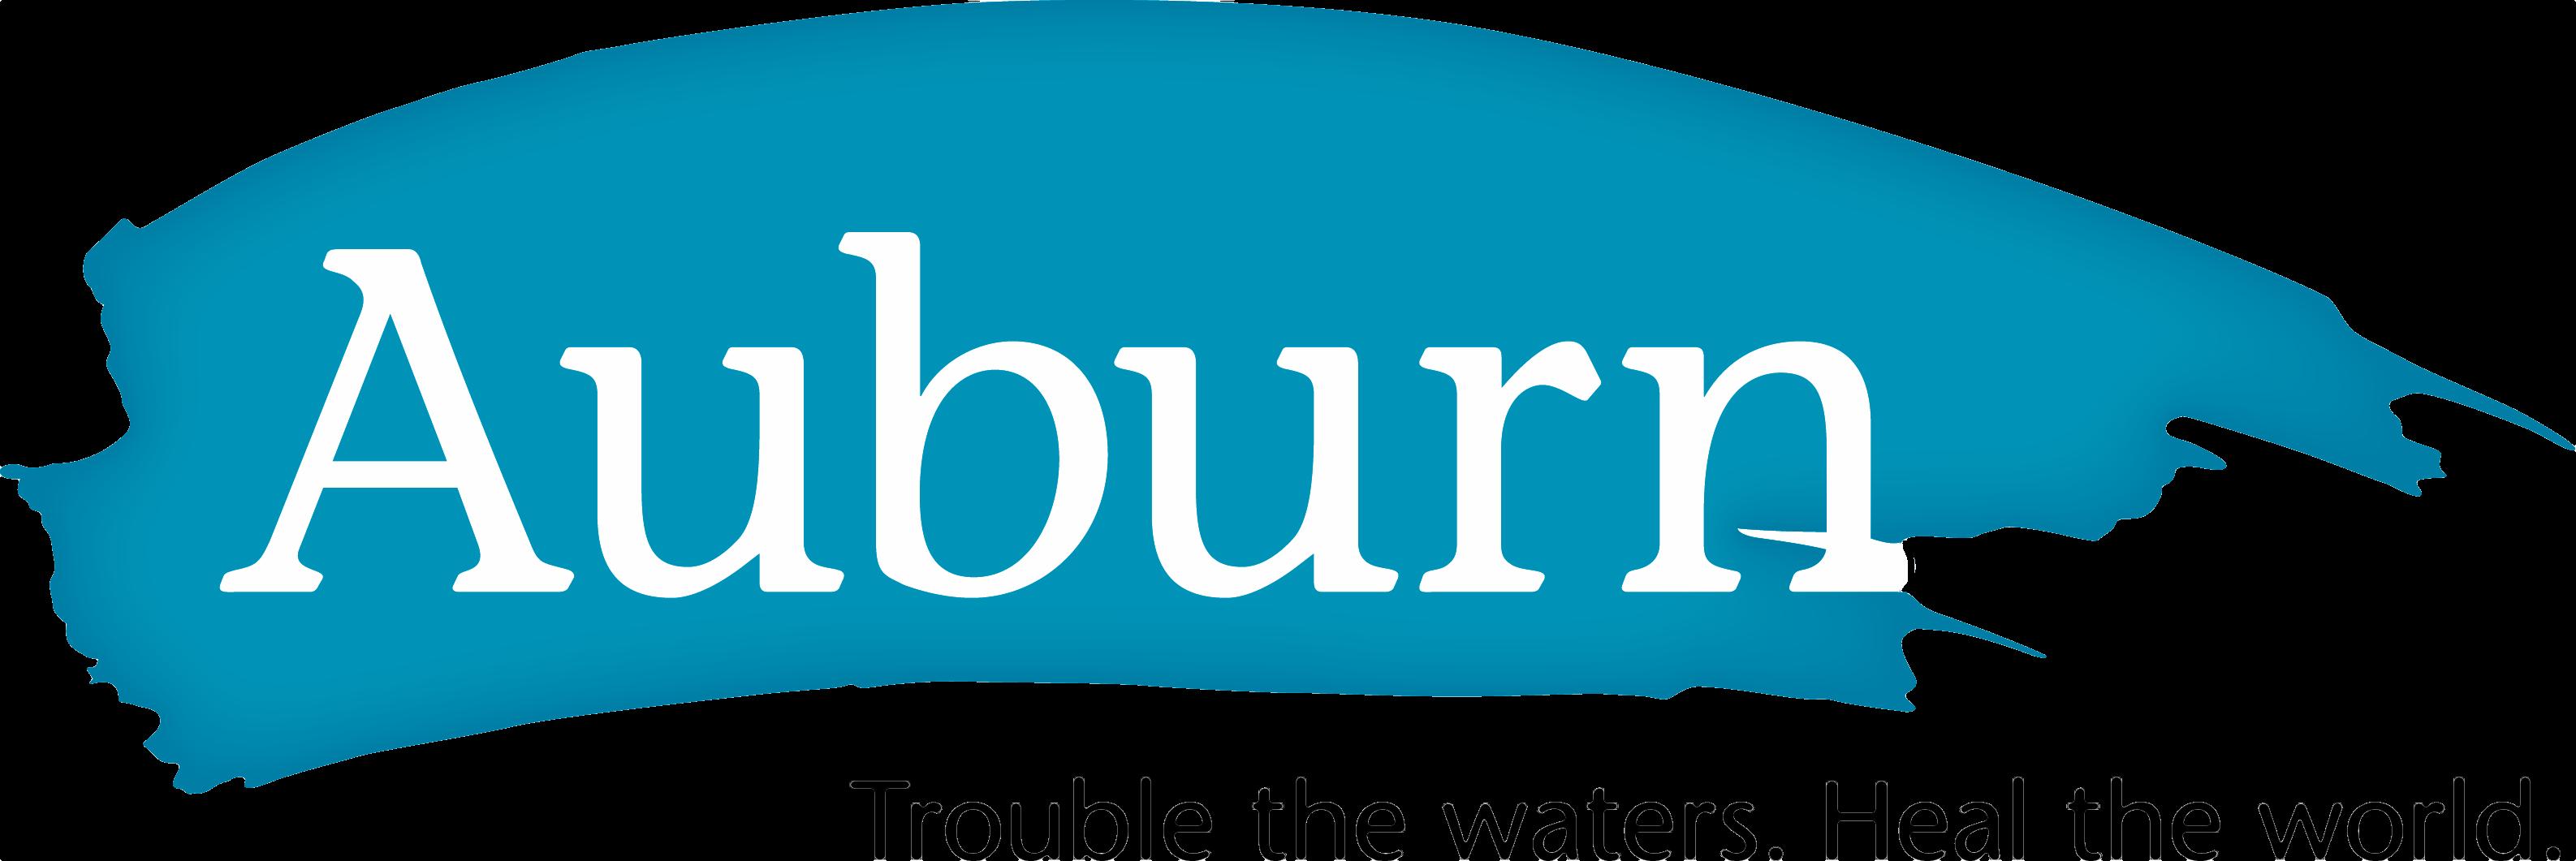 AuburnLogo_TwilightBlue_DarkTag